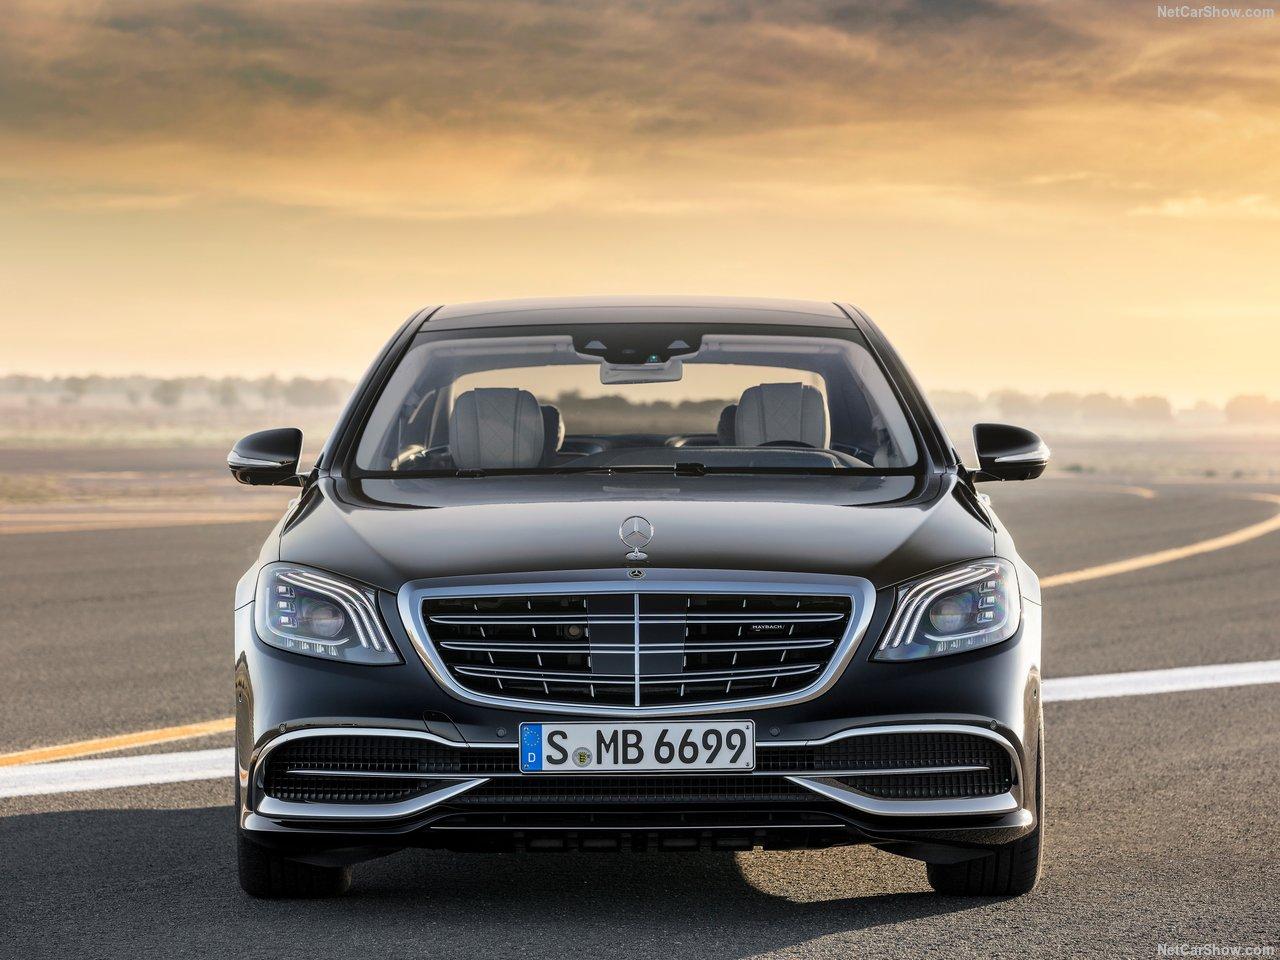 https://www.tuning-empire.com/wordpress/wp-content/uploads/Mercedes-Benz-S-Class_Maybach-facelift-upgrade-10.jpg